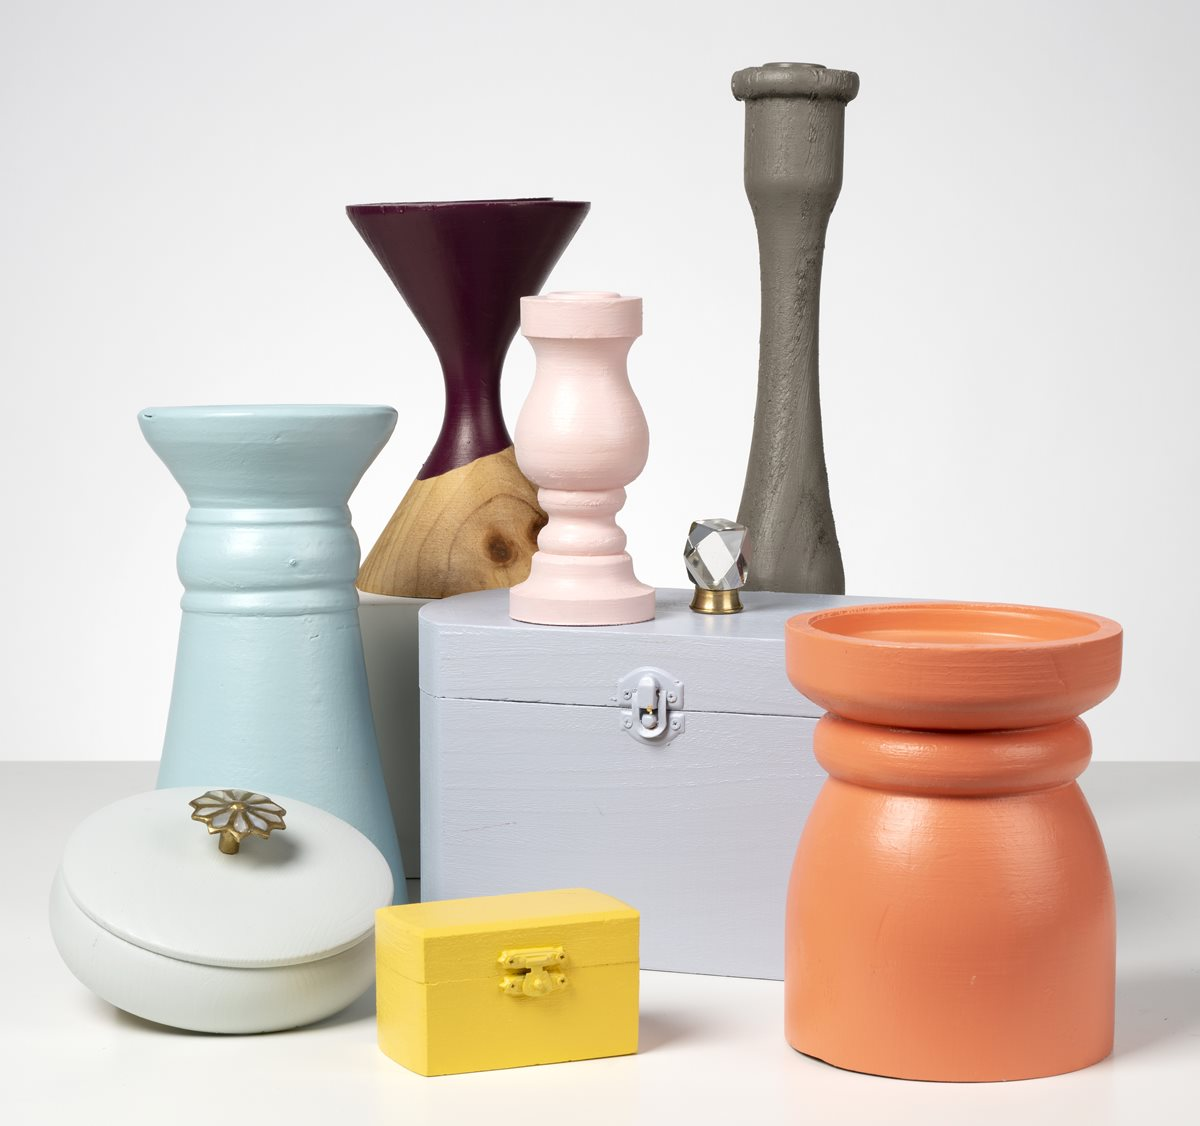 FolkArt One Decor Candlesticks & Trinket Boxes